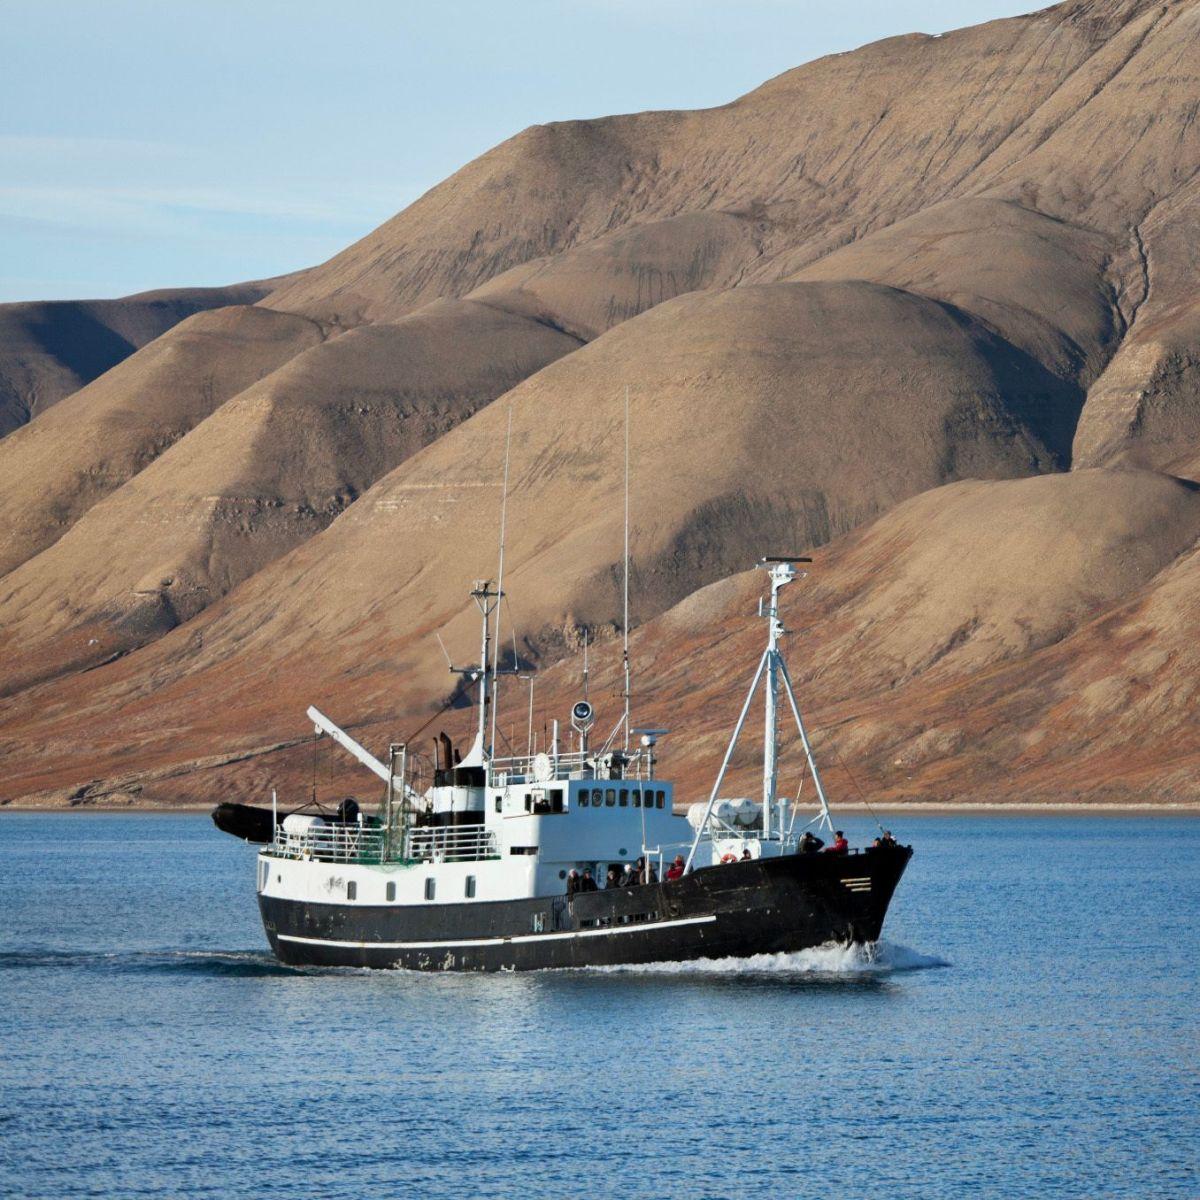 Fishing vessel in Svalbard